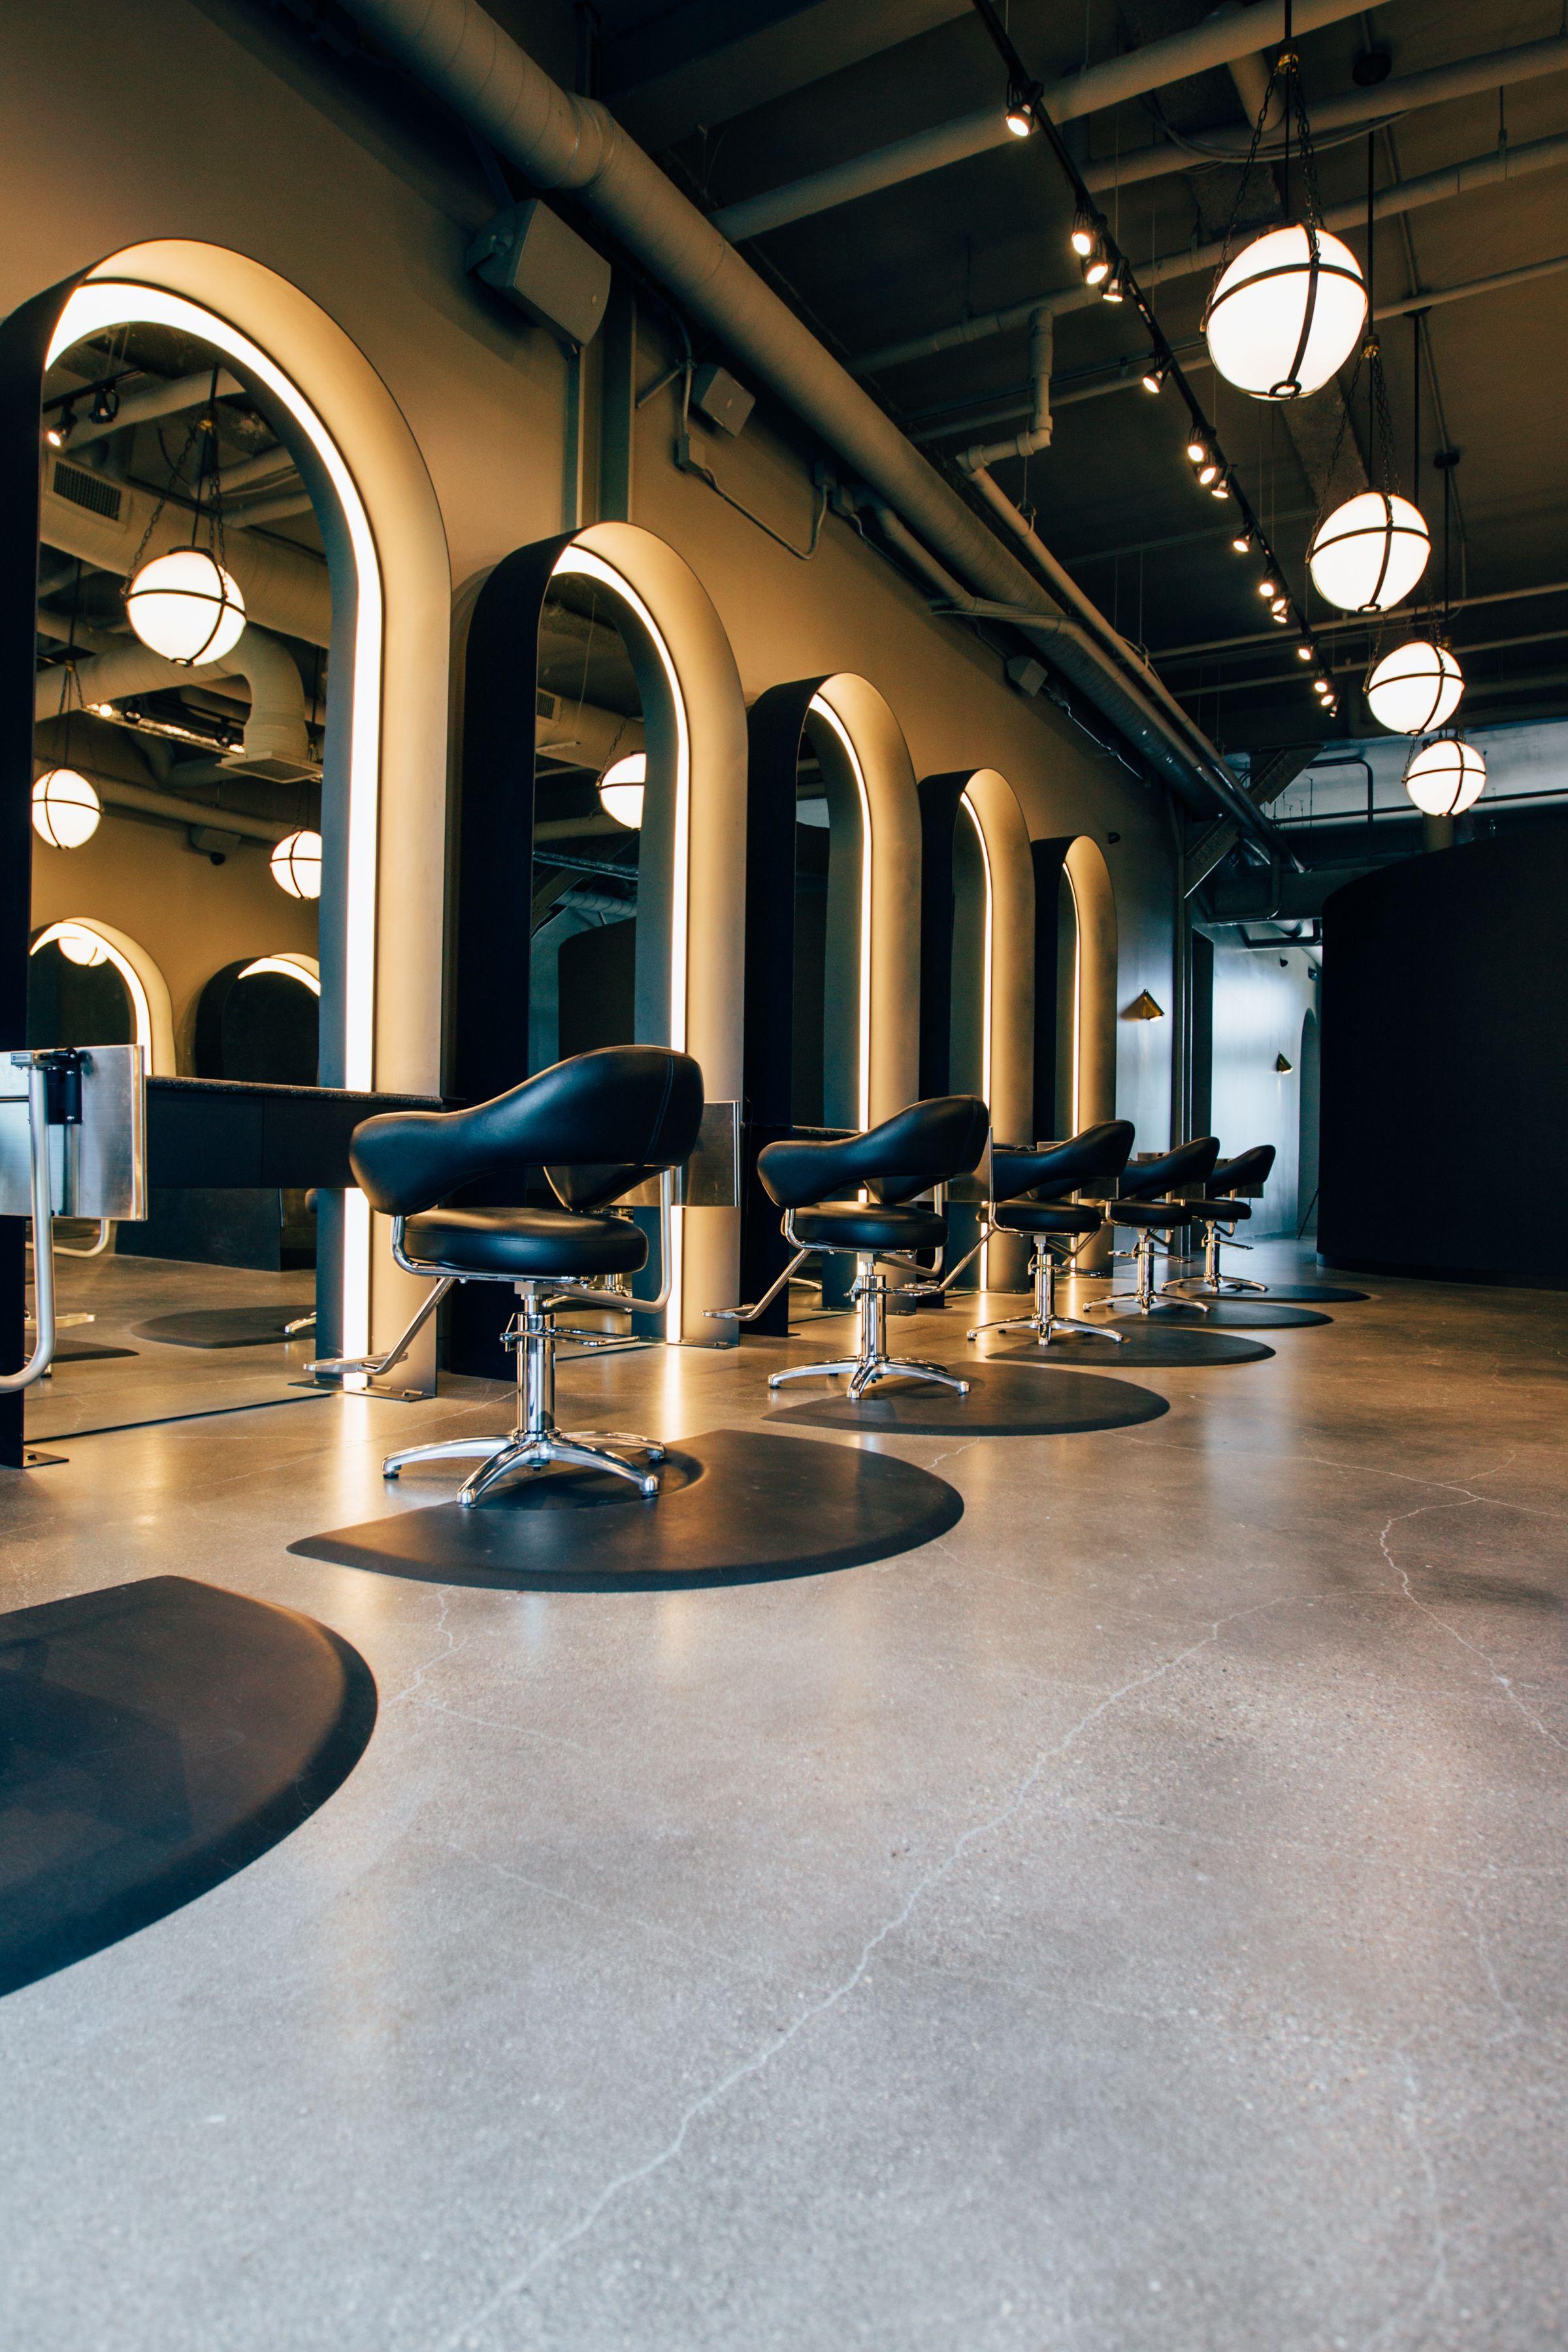 1 Indianapolis Hair Salon Photos  G Michael Salon  Saloes de beleza  Pinterest  Salons